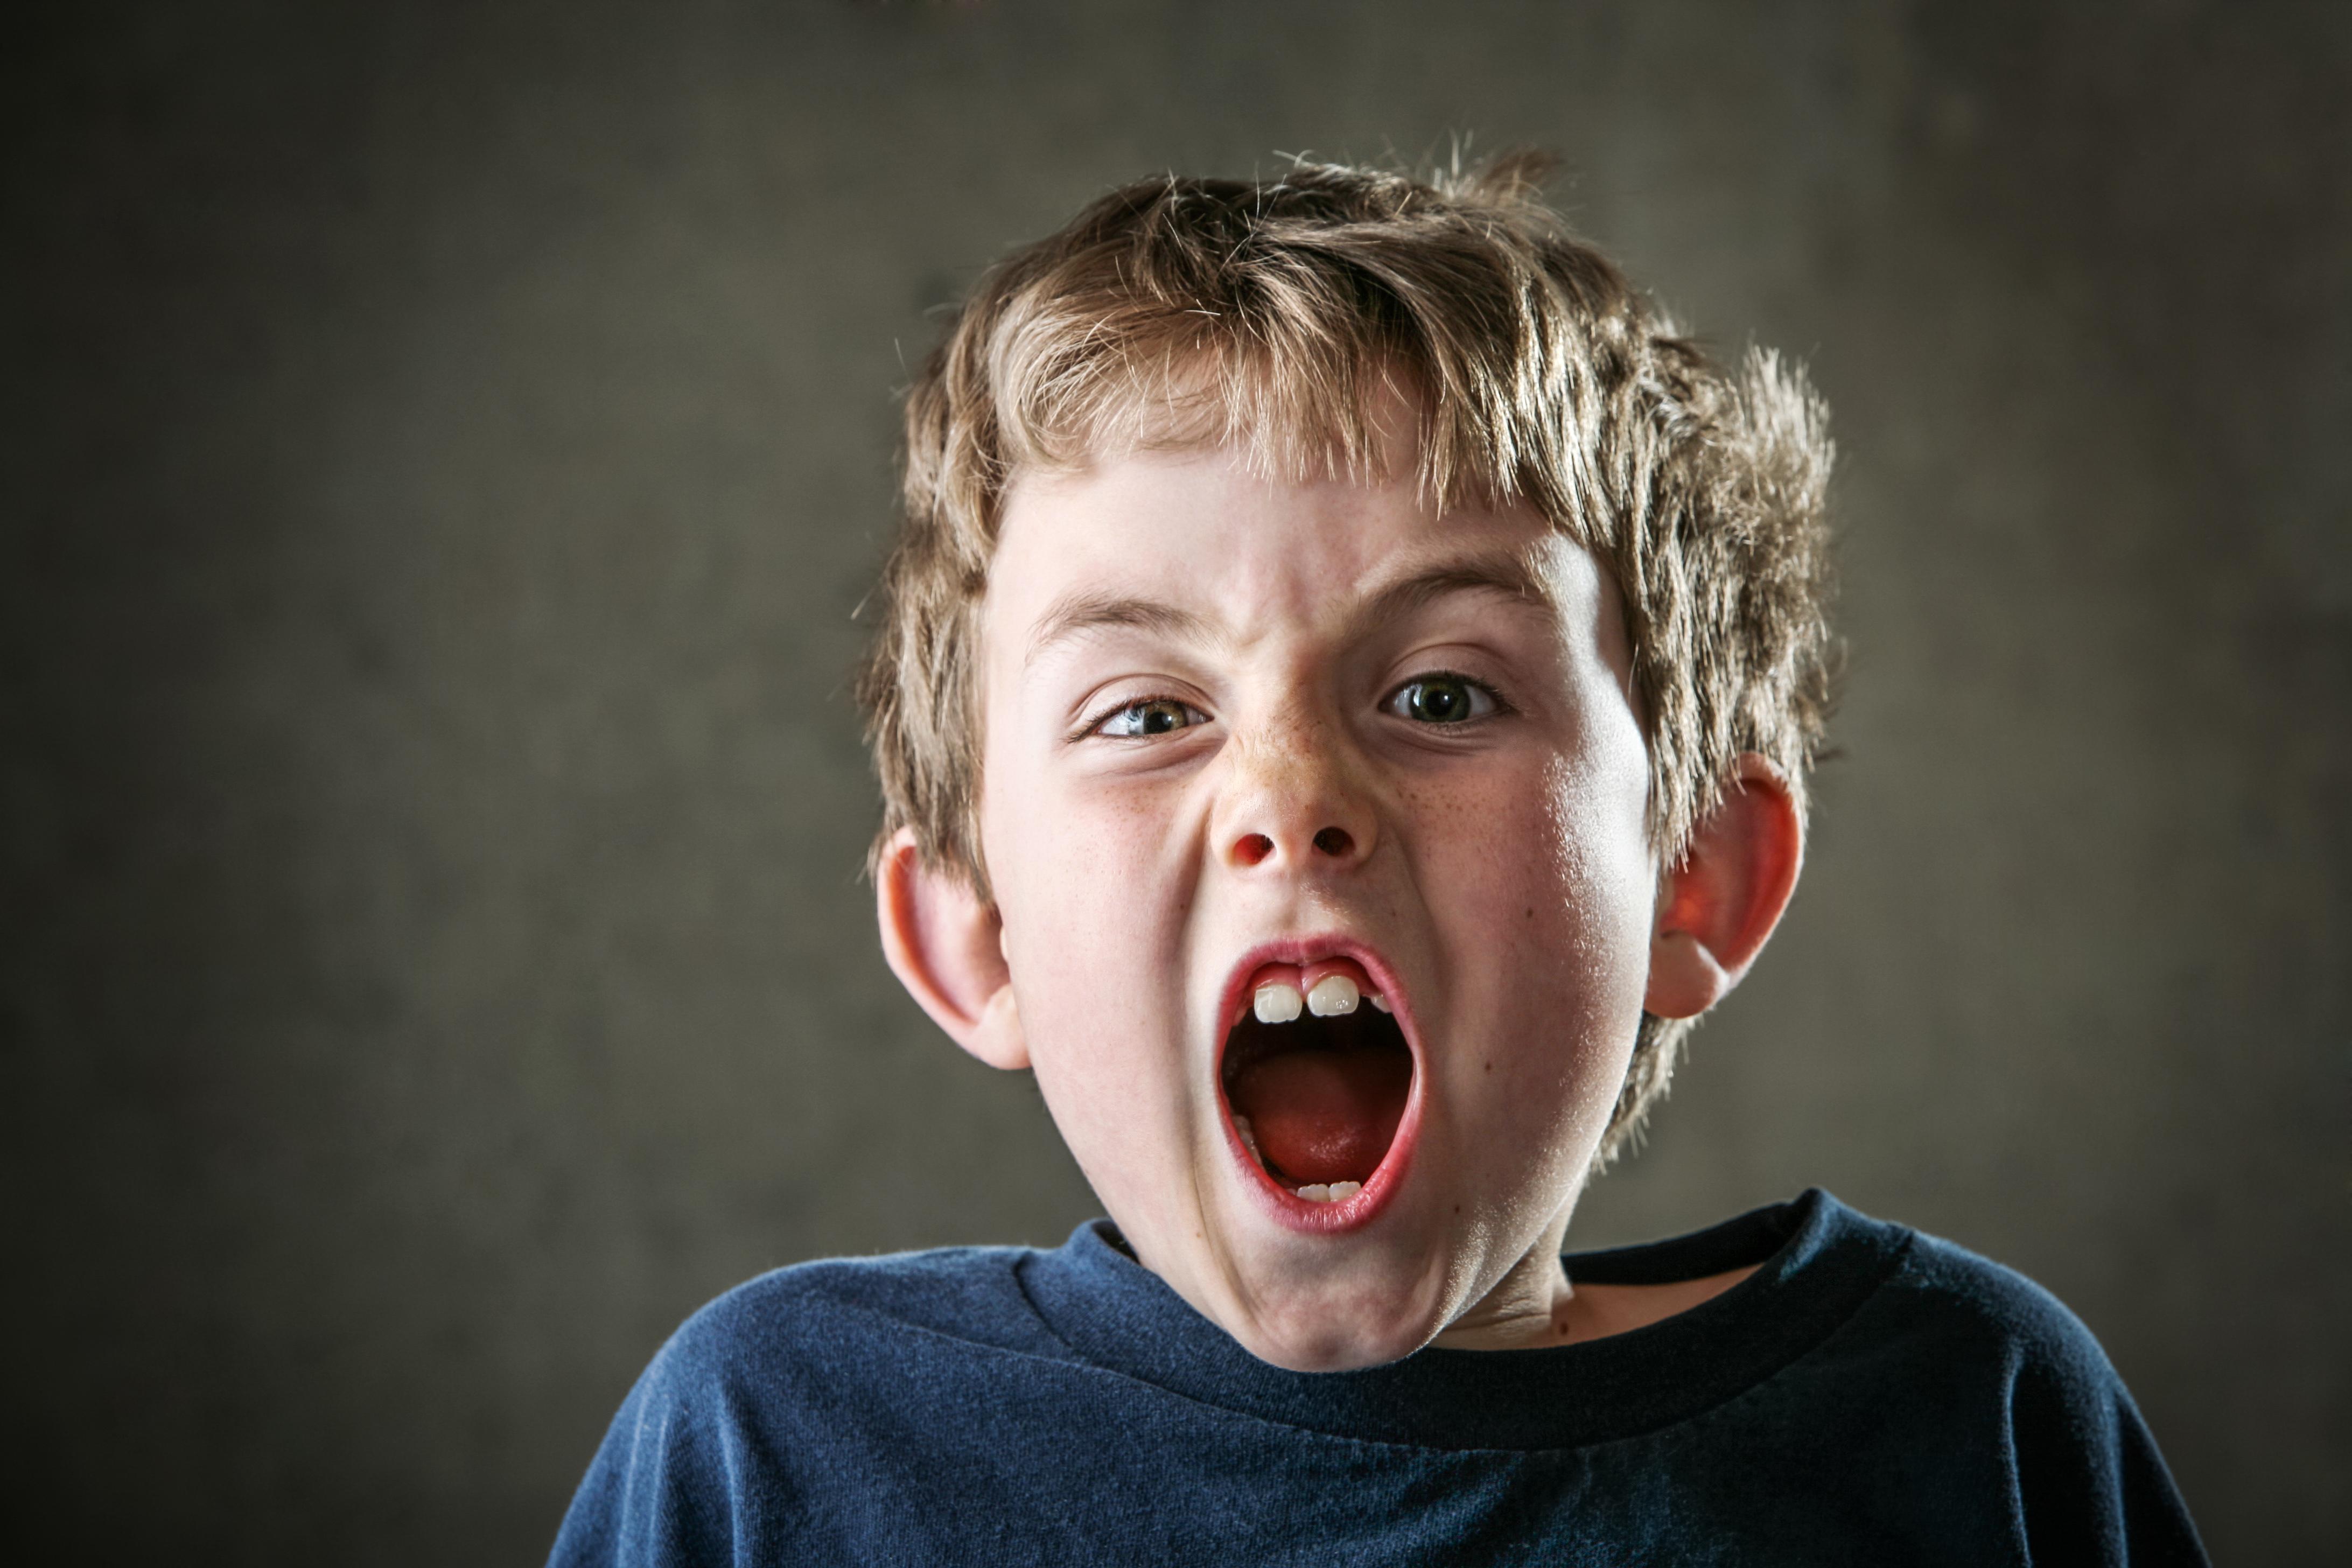 Photo of صراخ الطفل المستمر على طلب شيئ ونصائح للتغلب عليه